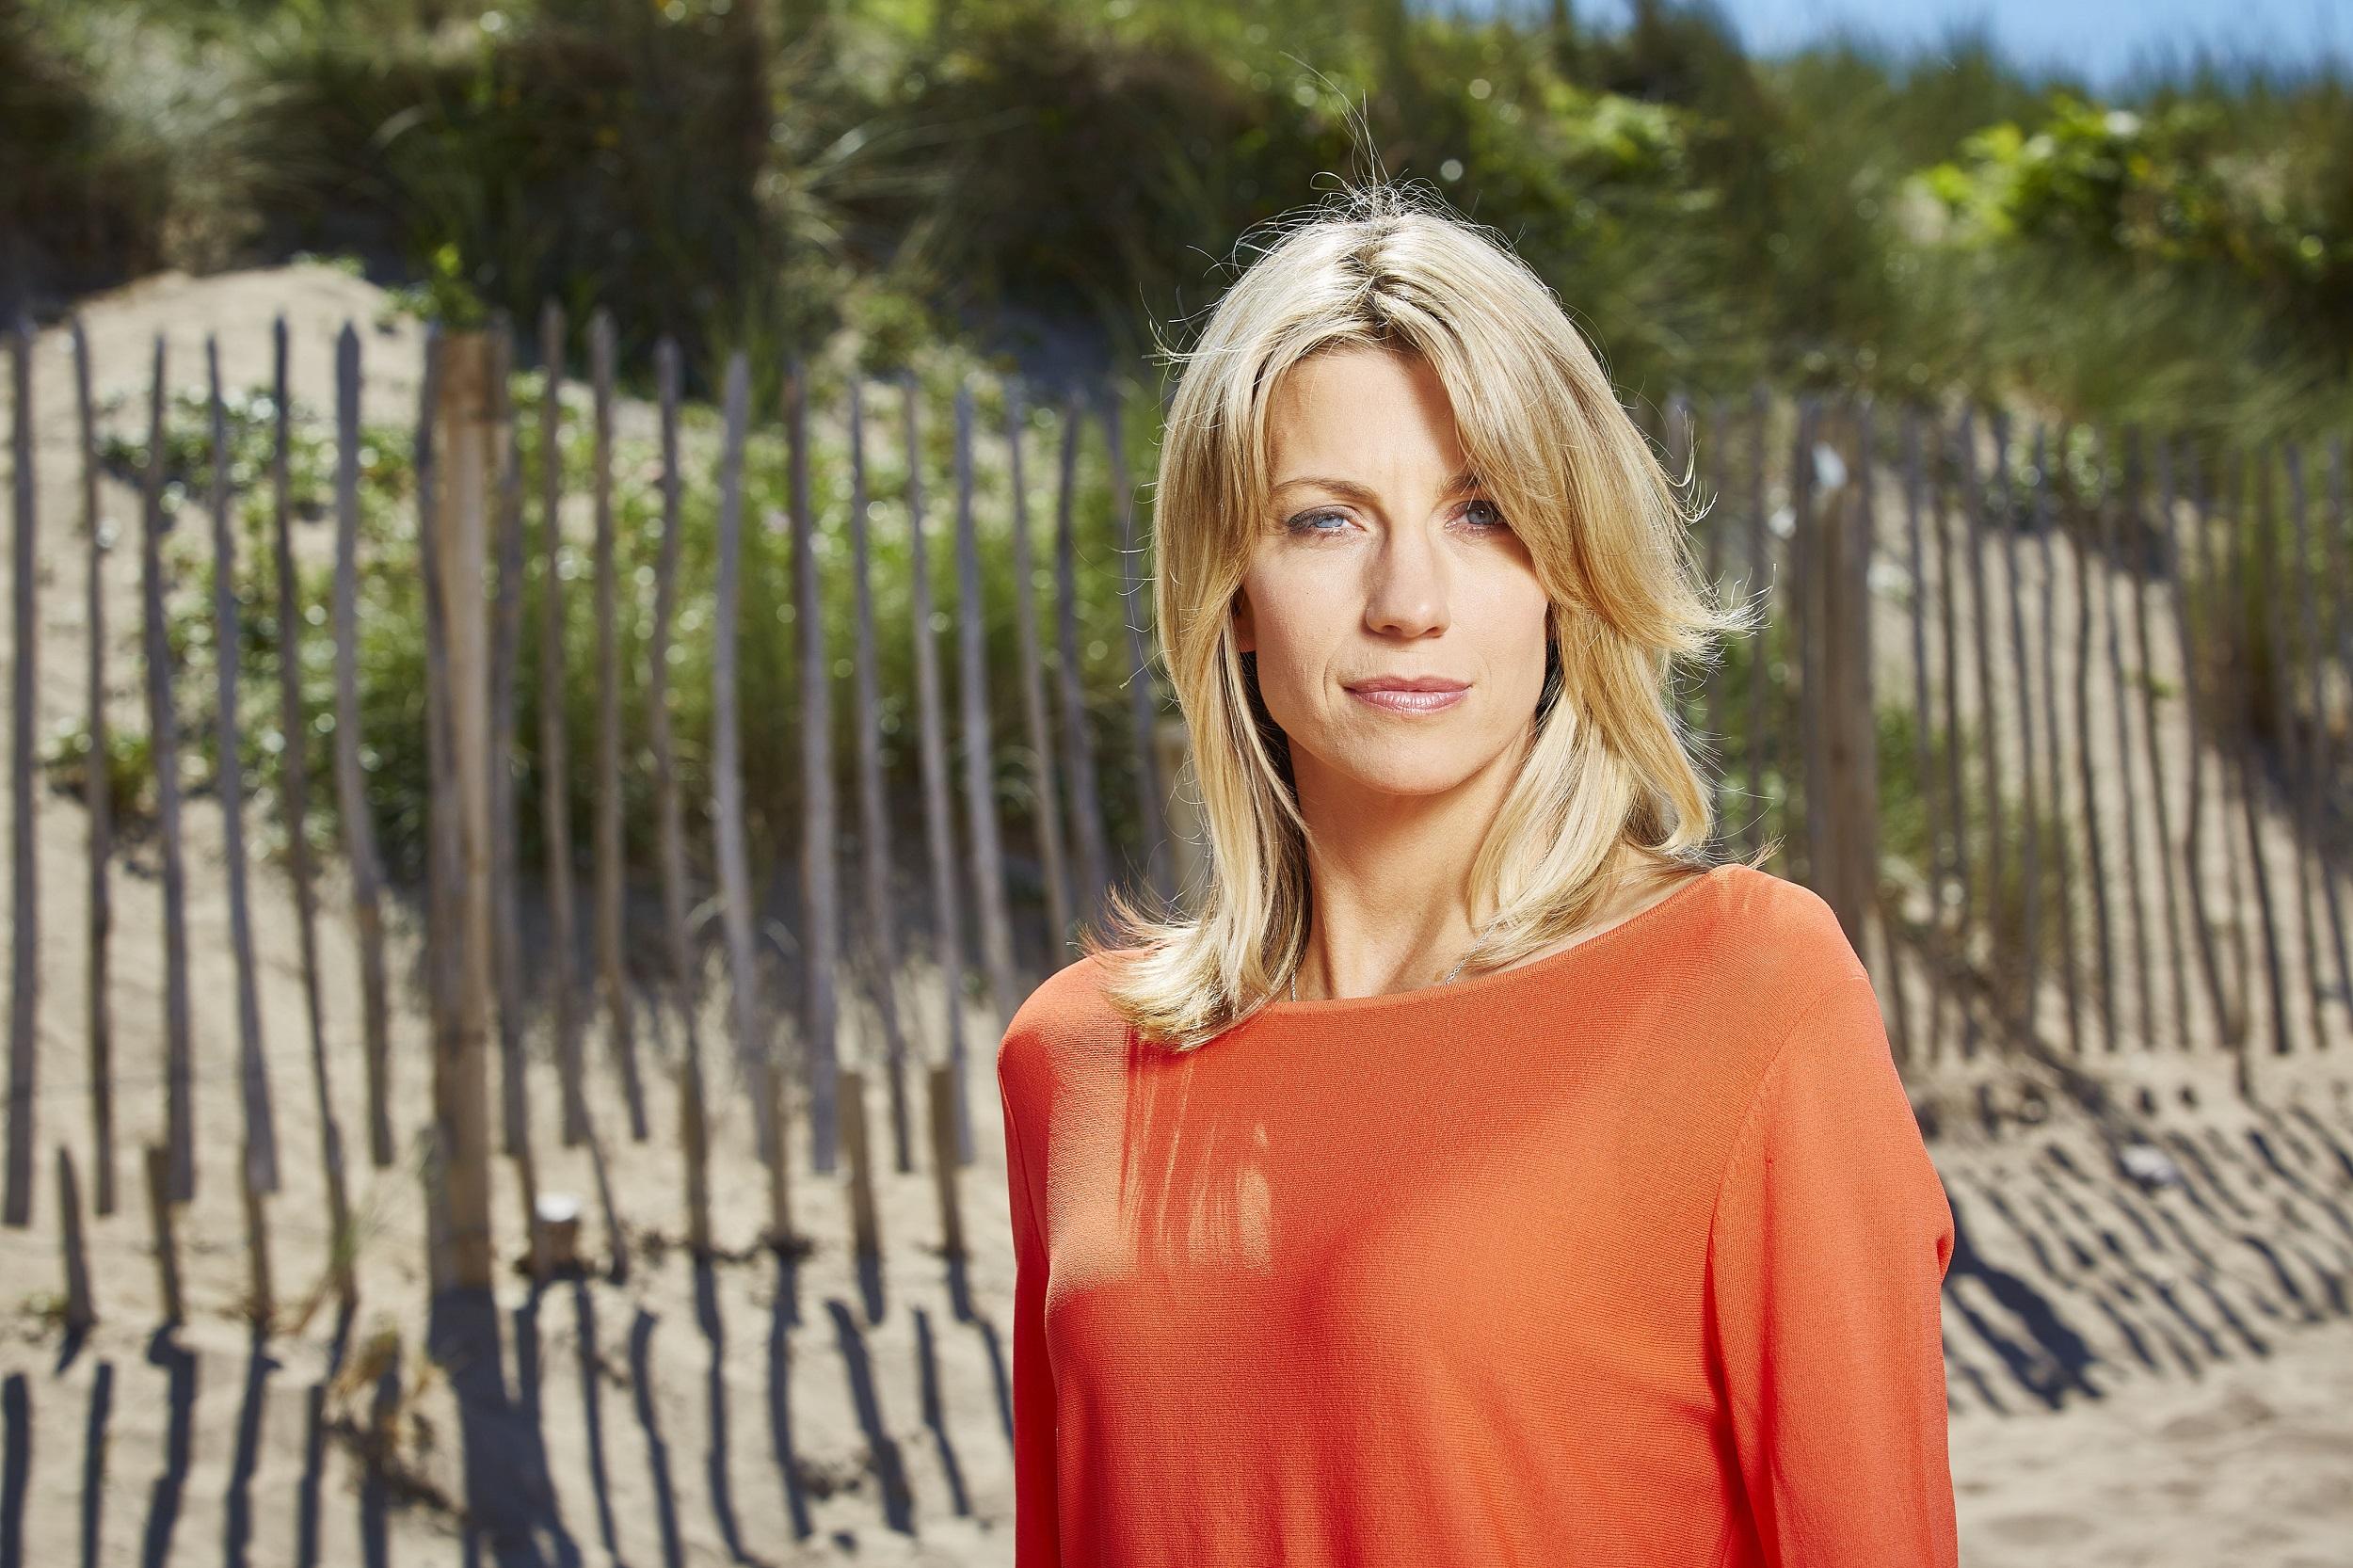 Stephanie Adams,Gabbi Garcia (b. 1998) Adult clips Susan Browning,Helen Hunt born June 15, 1963 (age 55)